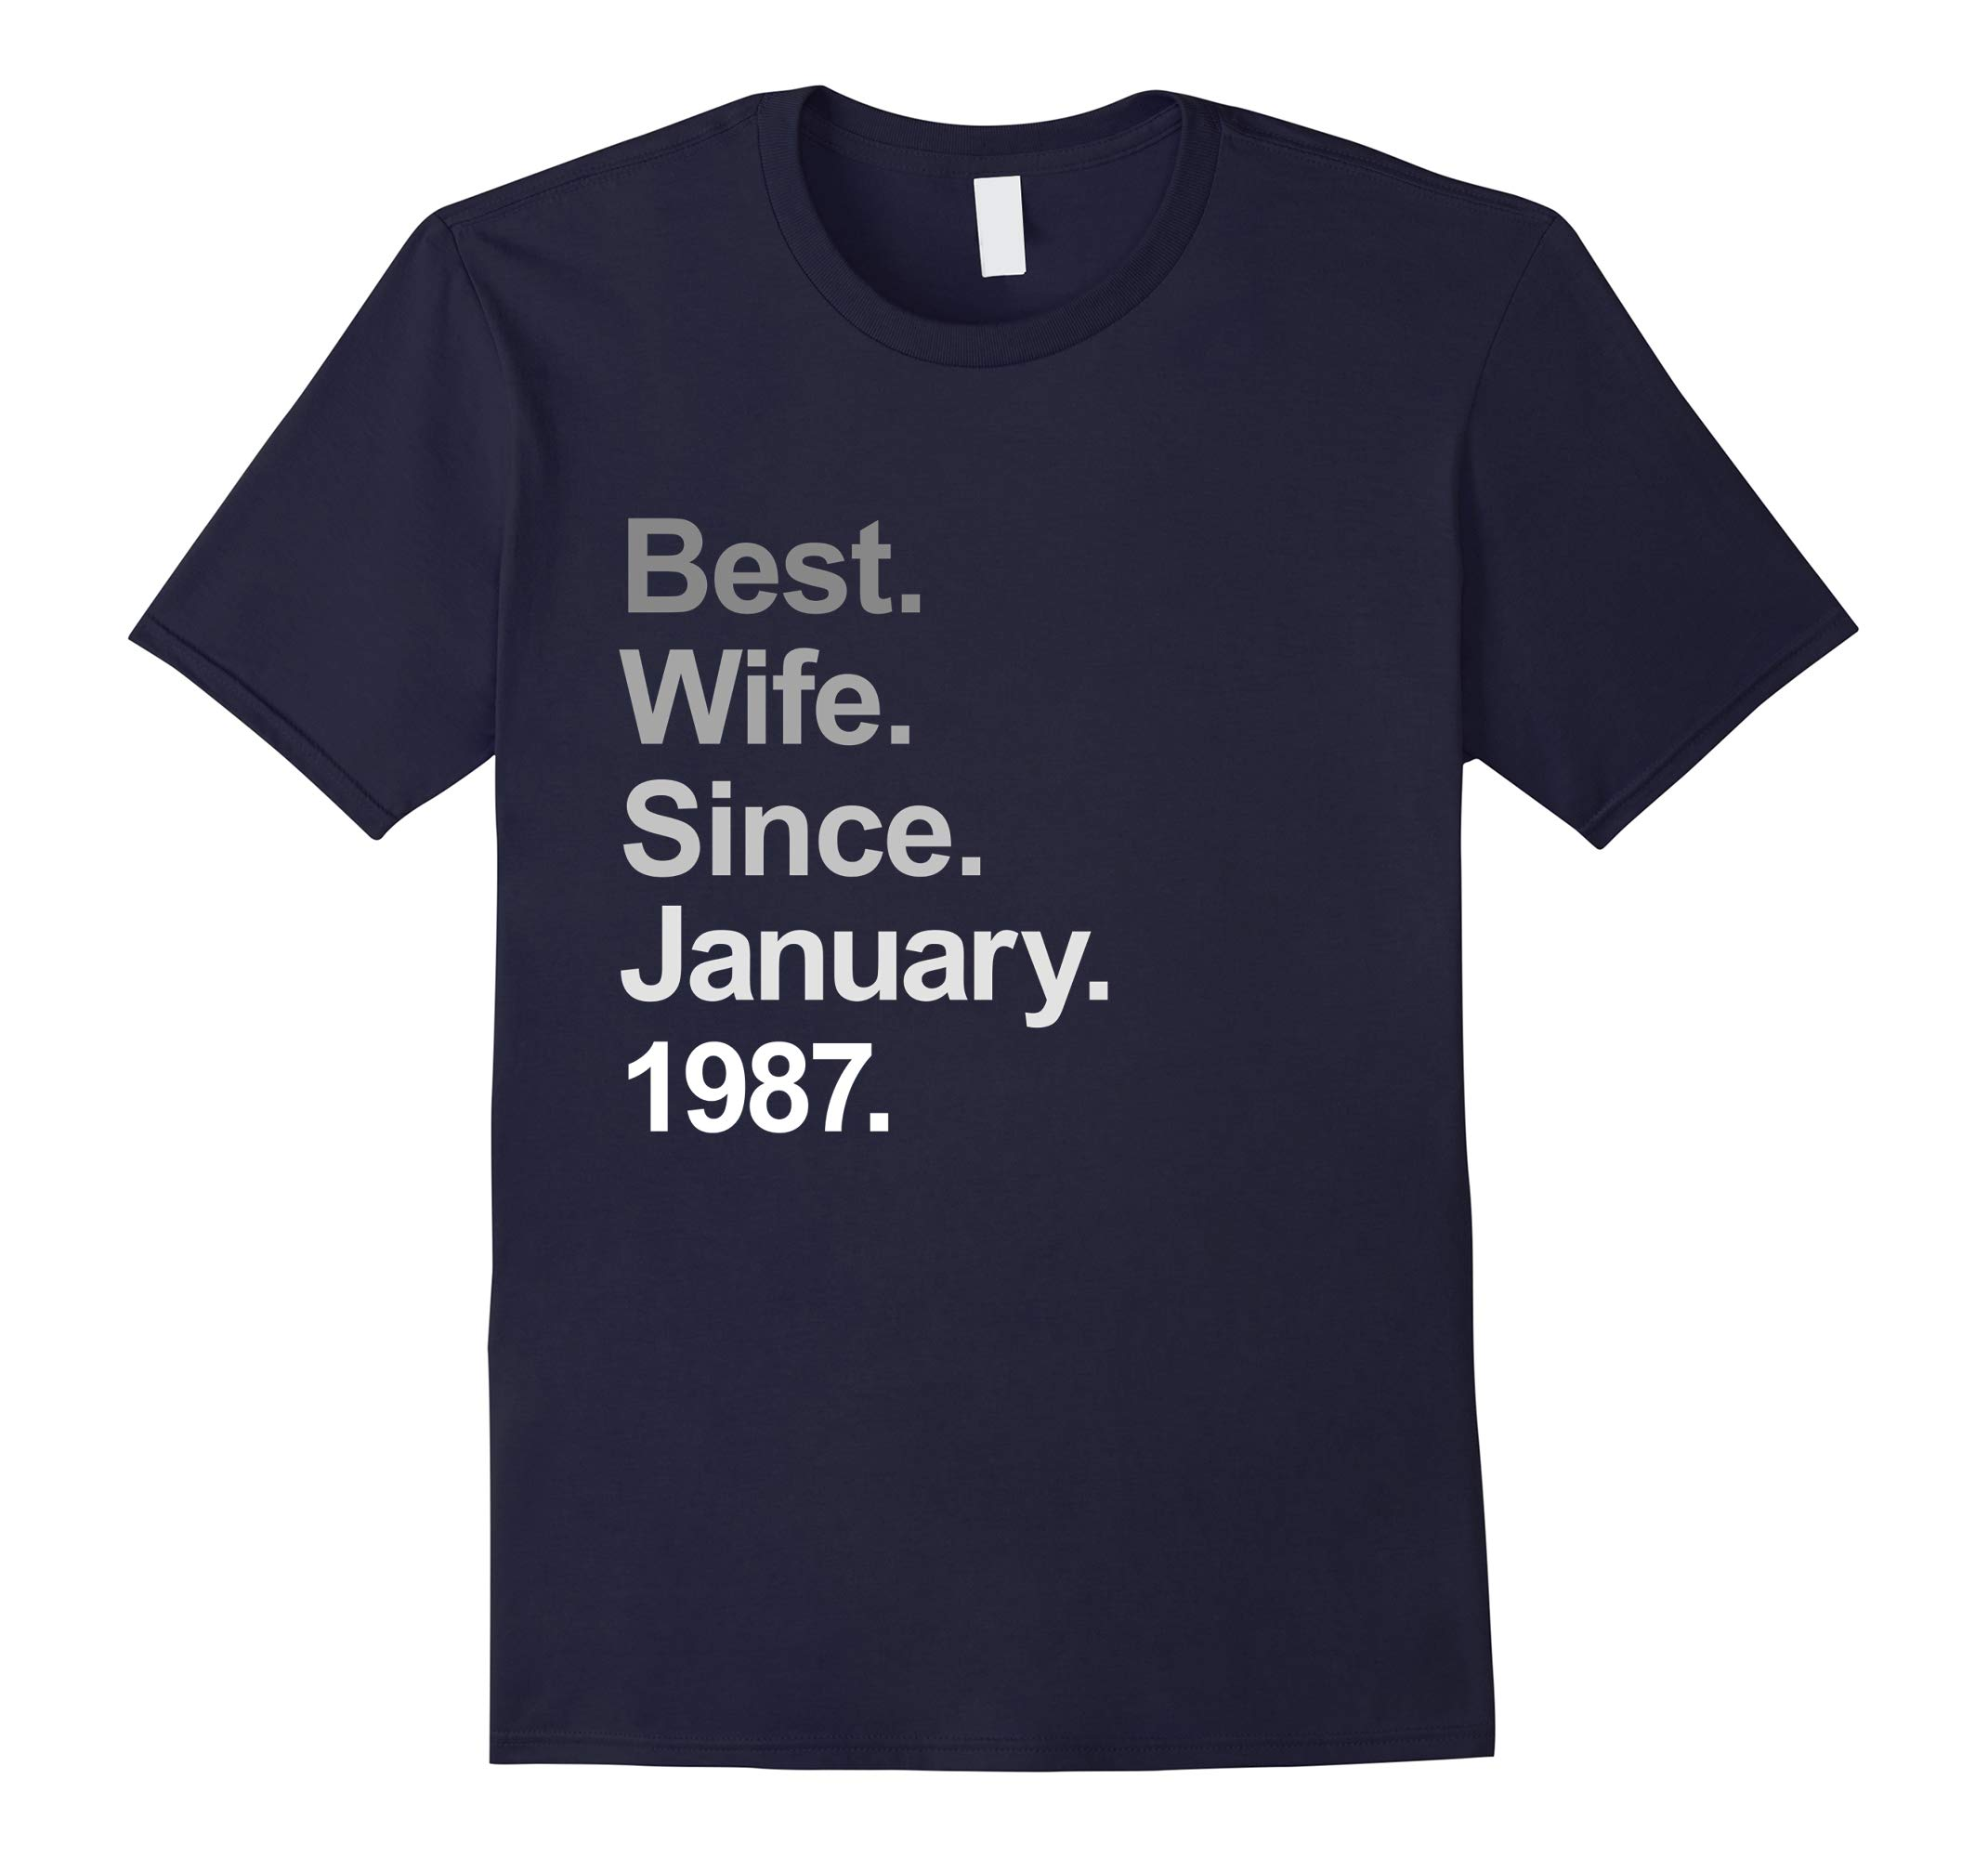 31st Wedding Anniversary Shirt, Best Wife Since January 1987-RT